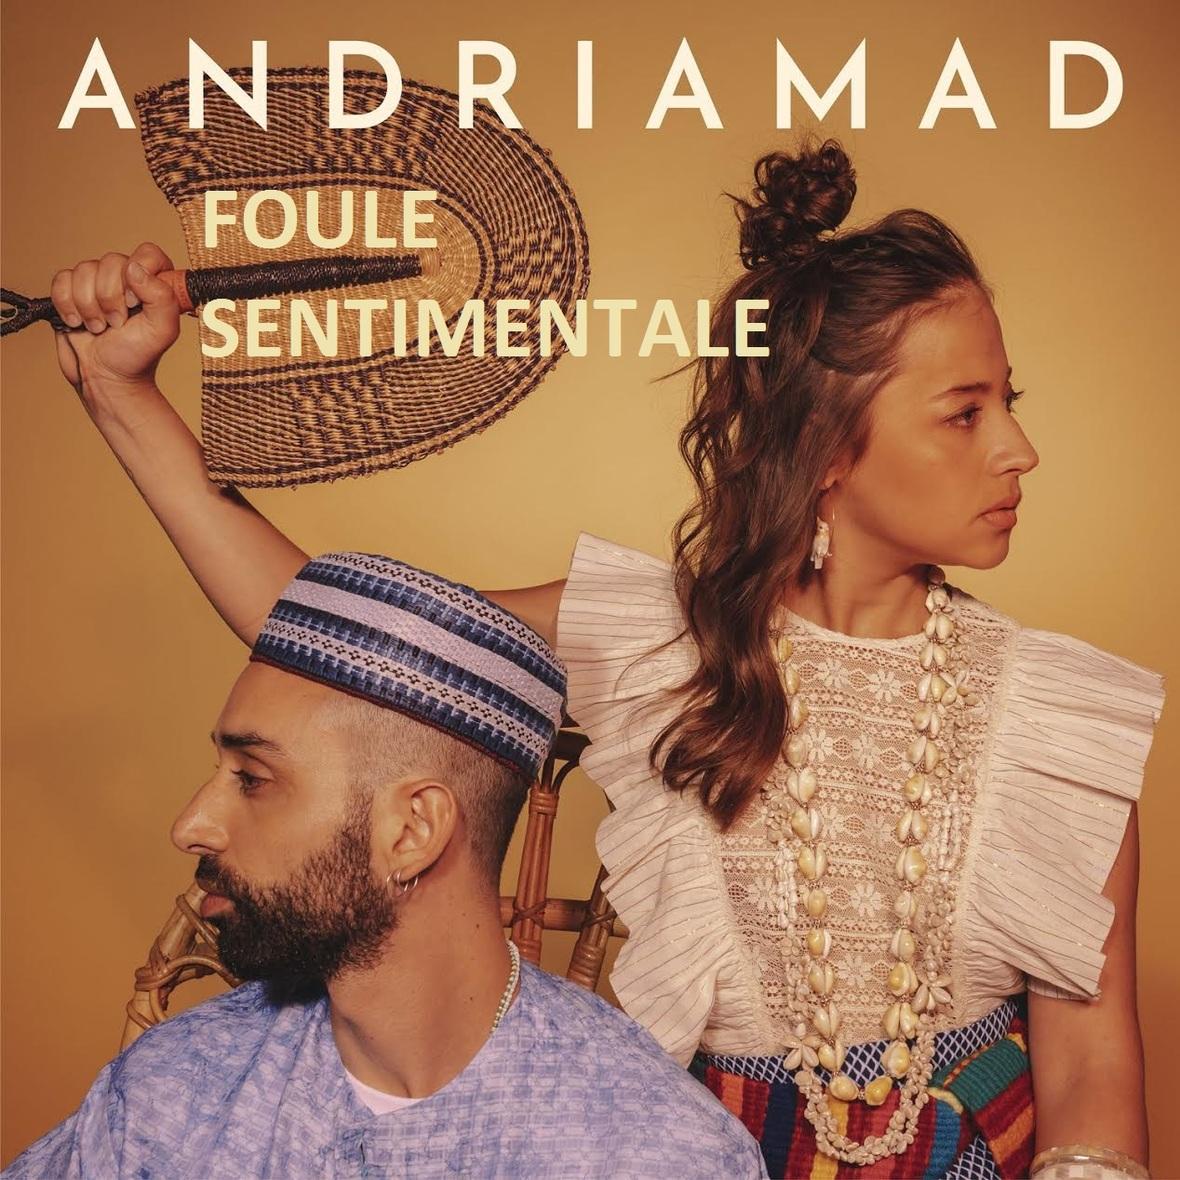 Andriamad - Foule Sentimentale